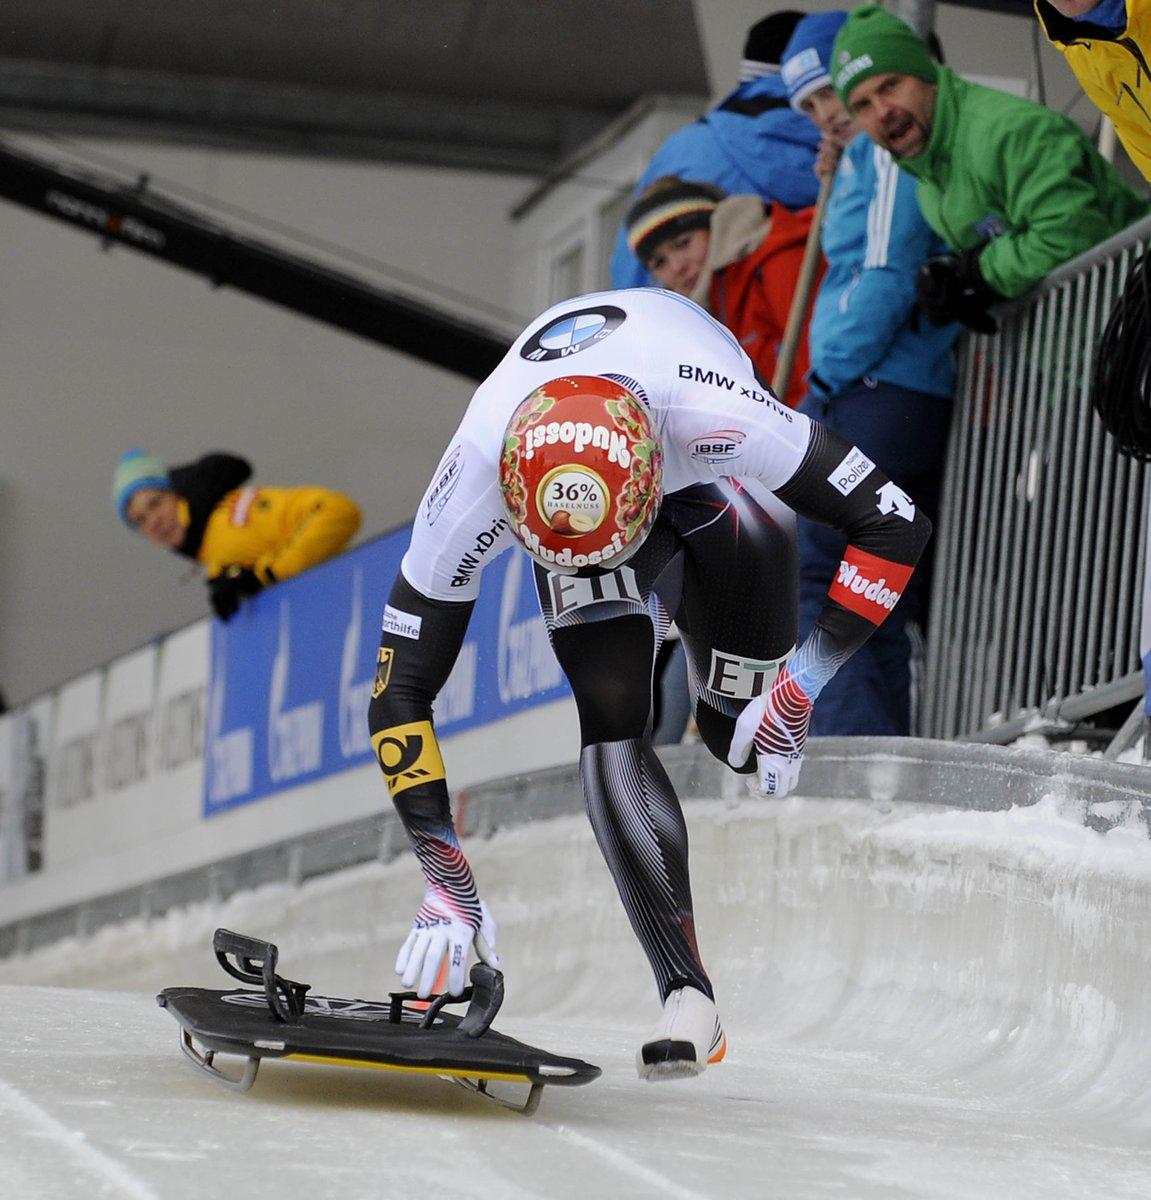 Skeleton: Griebel und Grotheer gewinnen erste Weltcup-Selektion in Winterberg #Skeleton #BSDteam #WirfuerD #TeamD https://t.co/b4U7yUWpZw